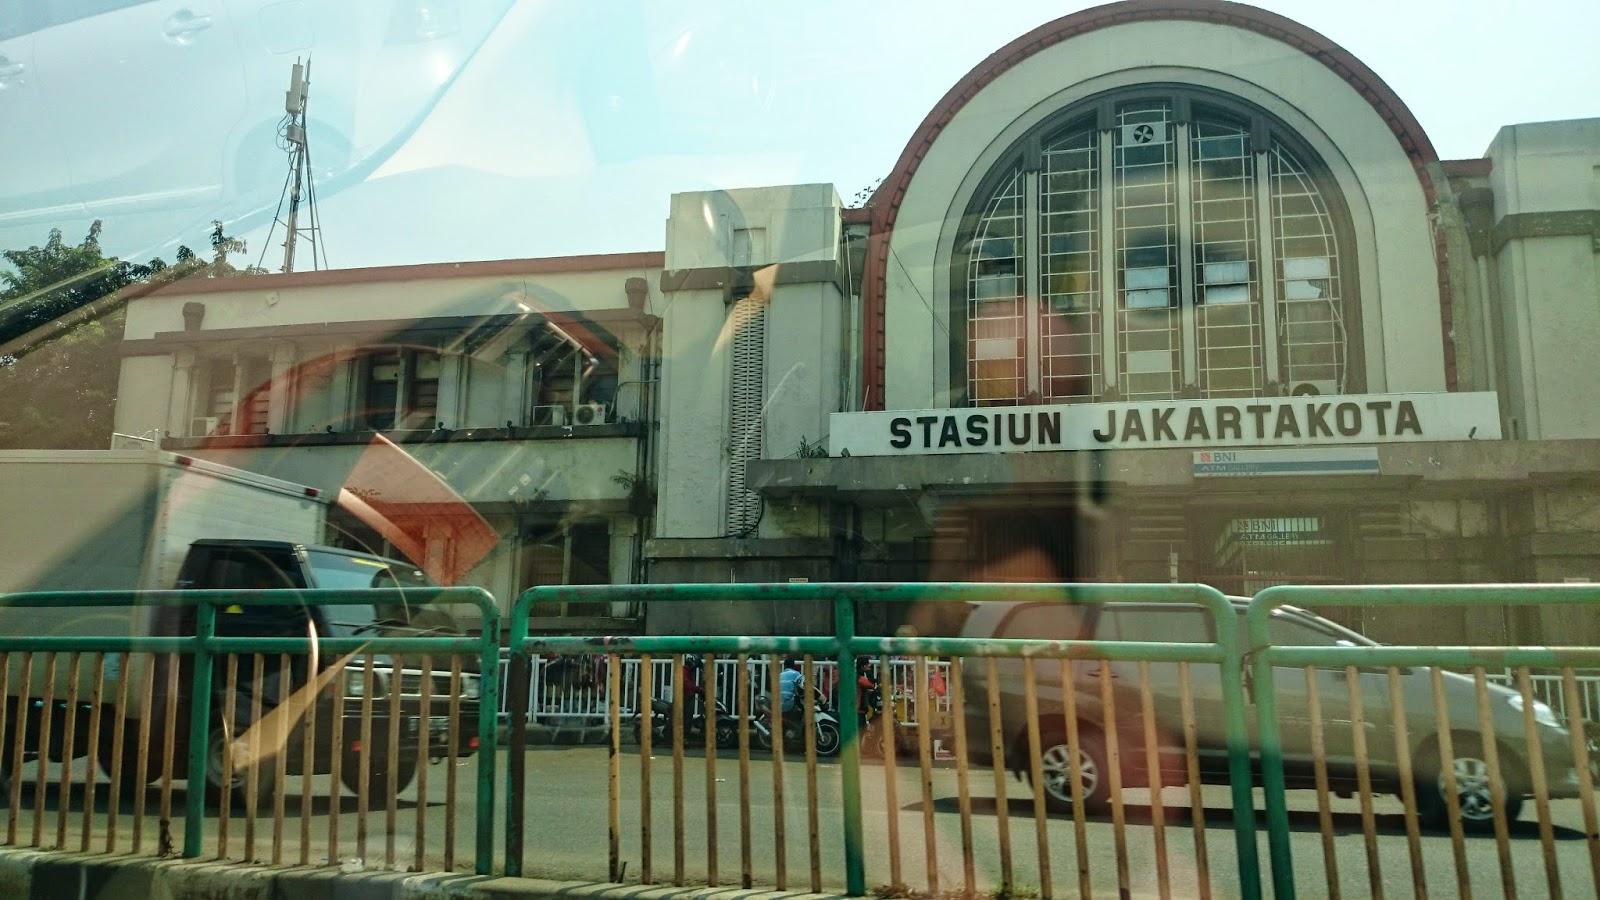 Berikut jadwal dan trayek kereta api di stasiun Jakarta Kota